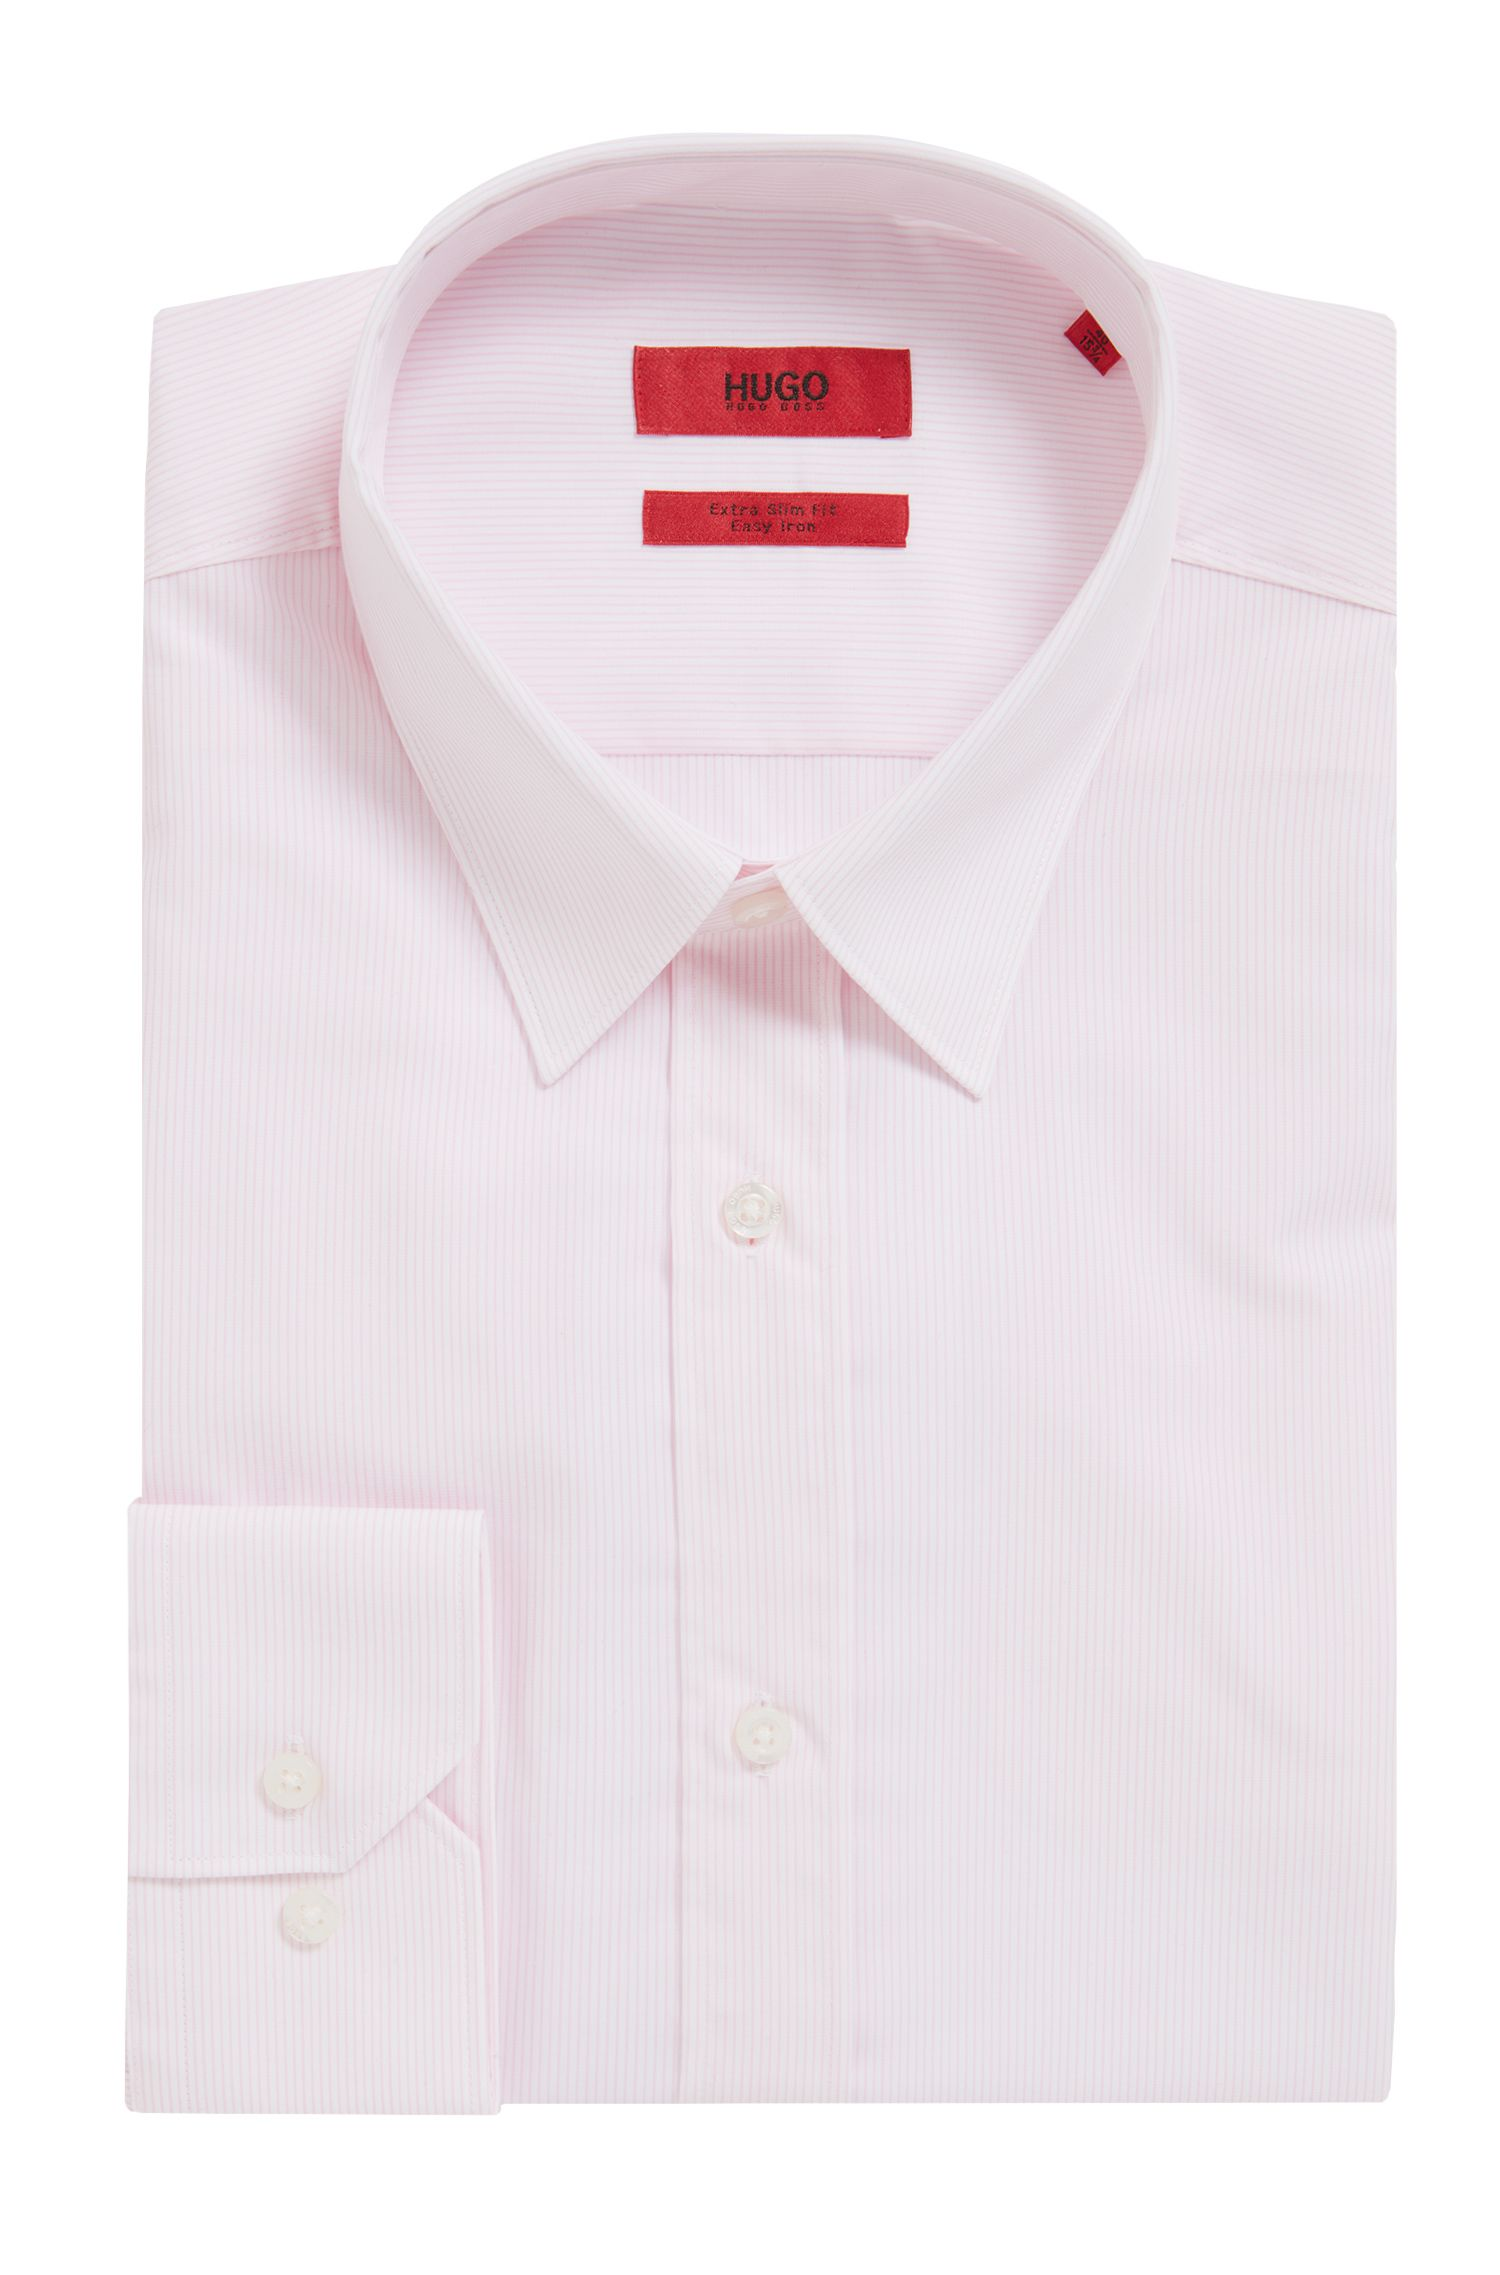 Striped Easy Iron Cotton Dress Shirt, Slim Fit | Elisha, light pink